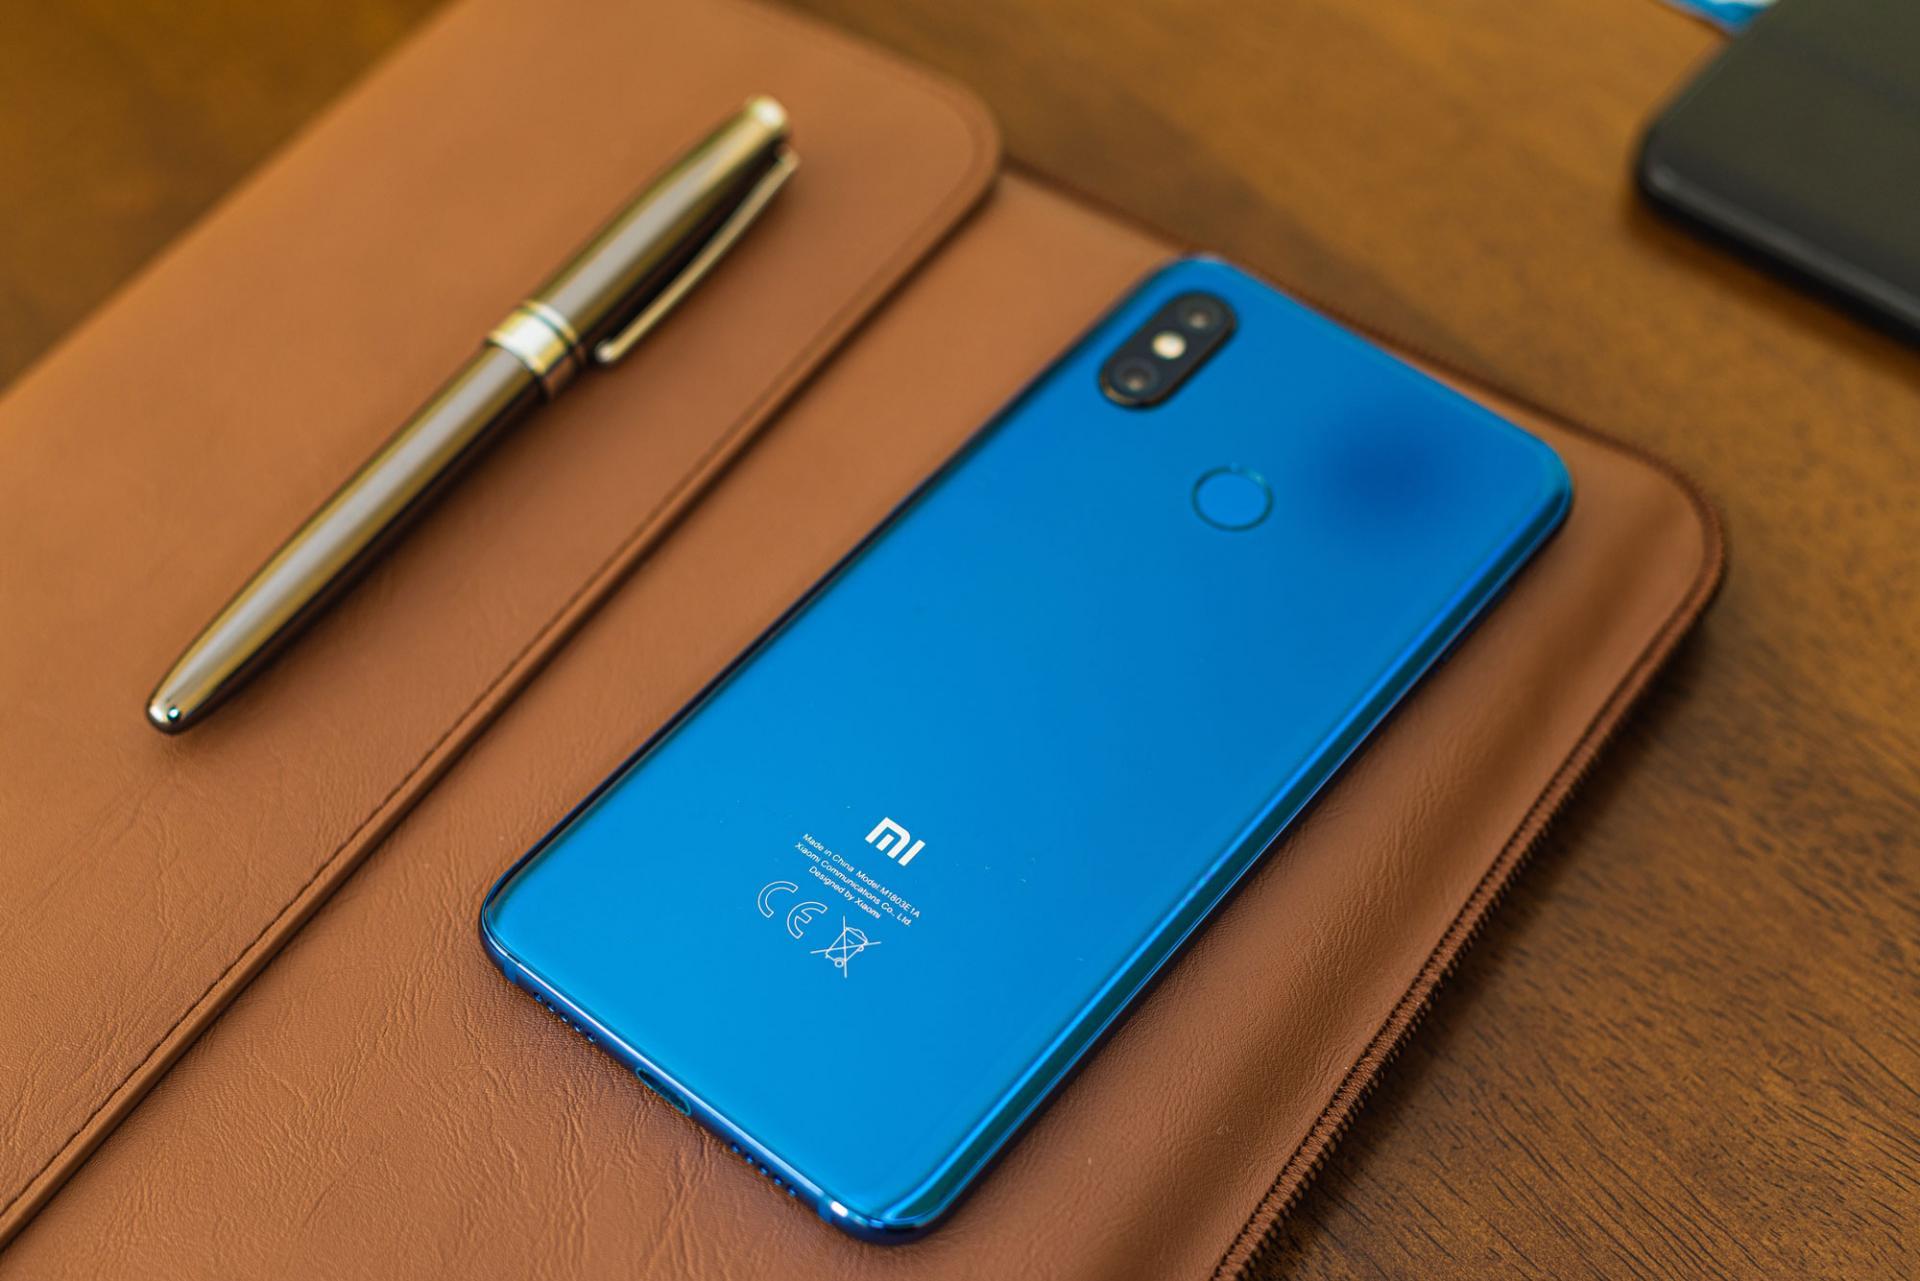 Преимущества Xiaomi перед другими смартфонами